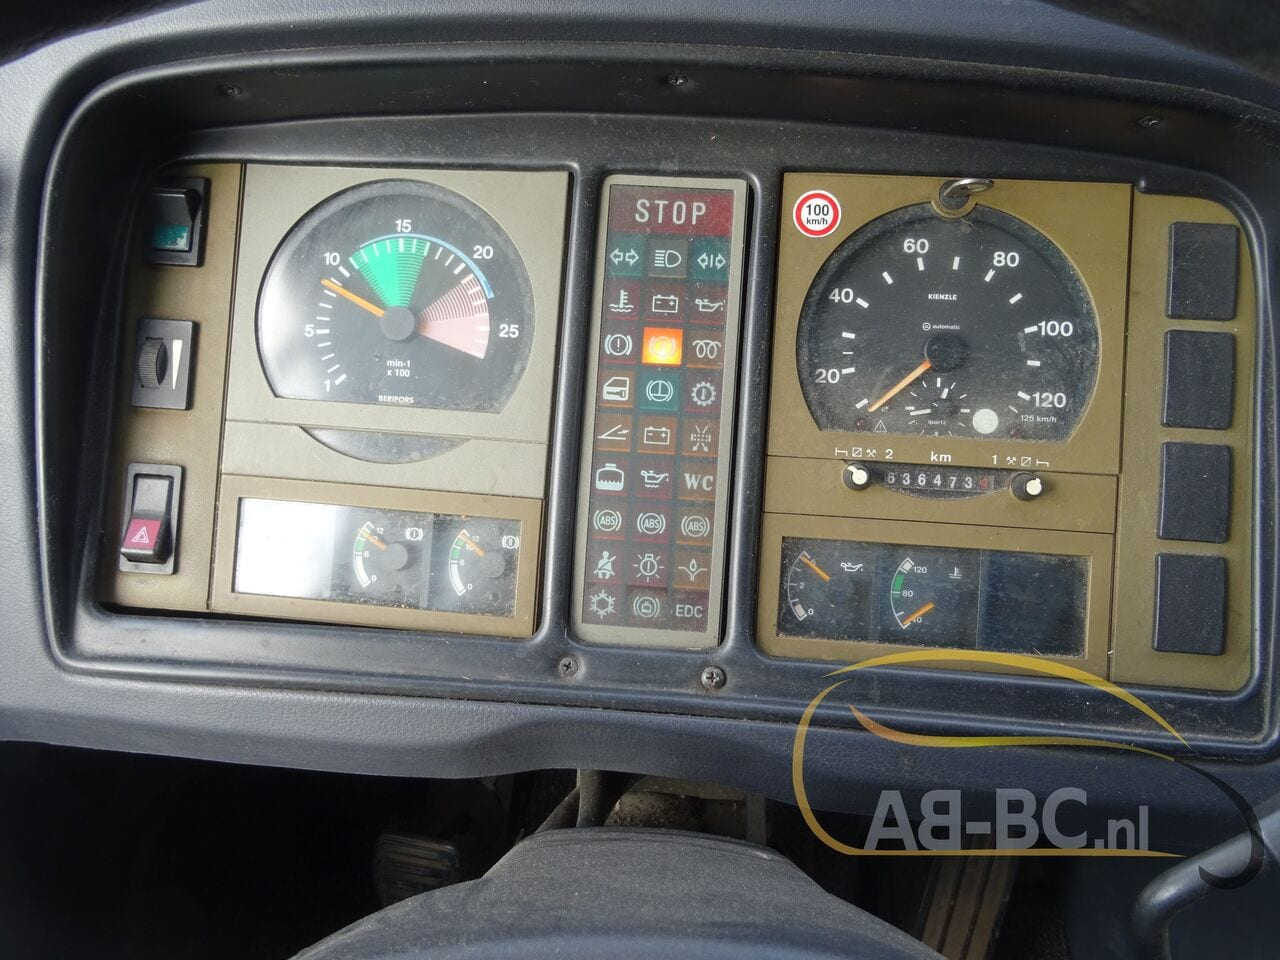 coach-busTEMSA-Safari-RD-65-Seats---1620311910758991249_big_68e2e7e89a0a461383da084197cd7132--21050617272795316700